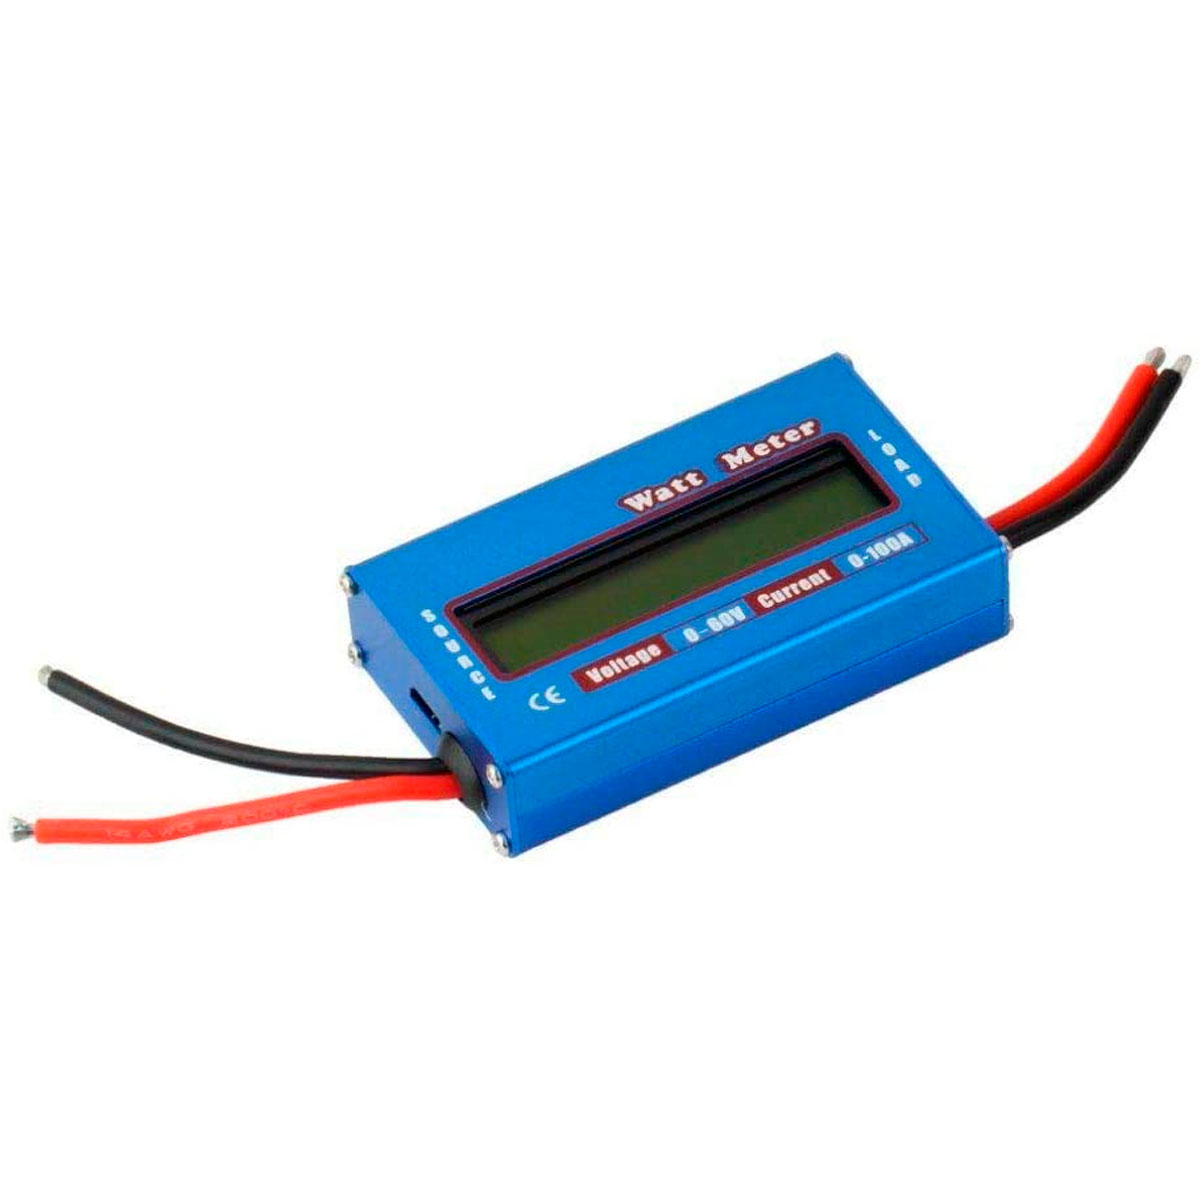 Wattimetro DC 4,5v a 60v Voltimetro e Amperimetro 0 a 100A